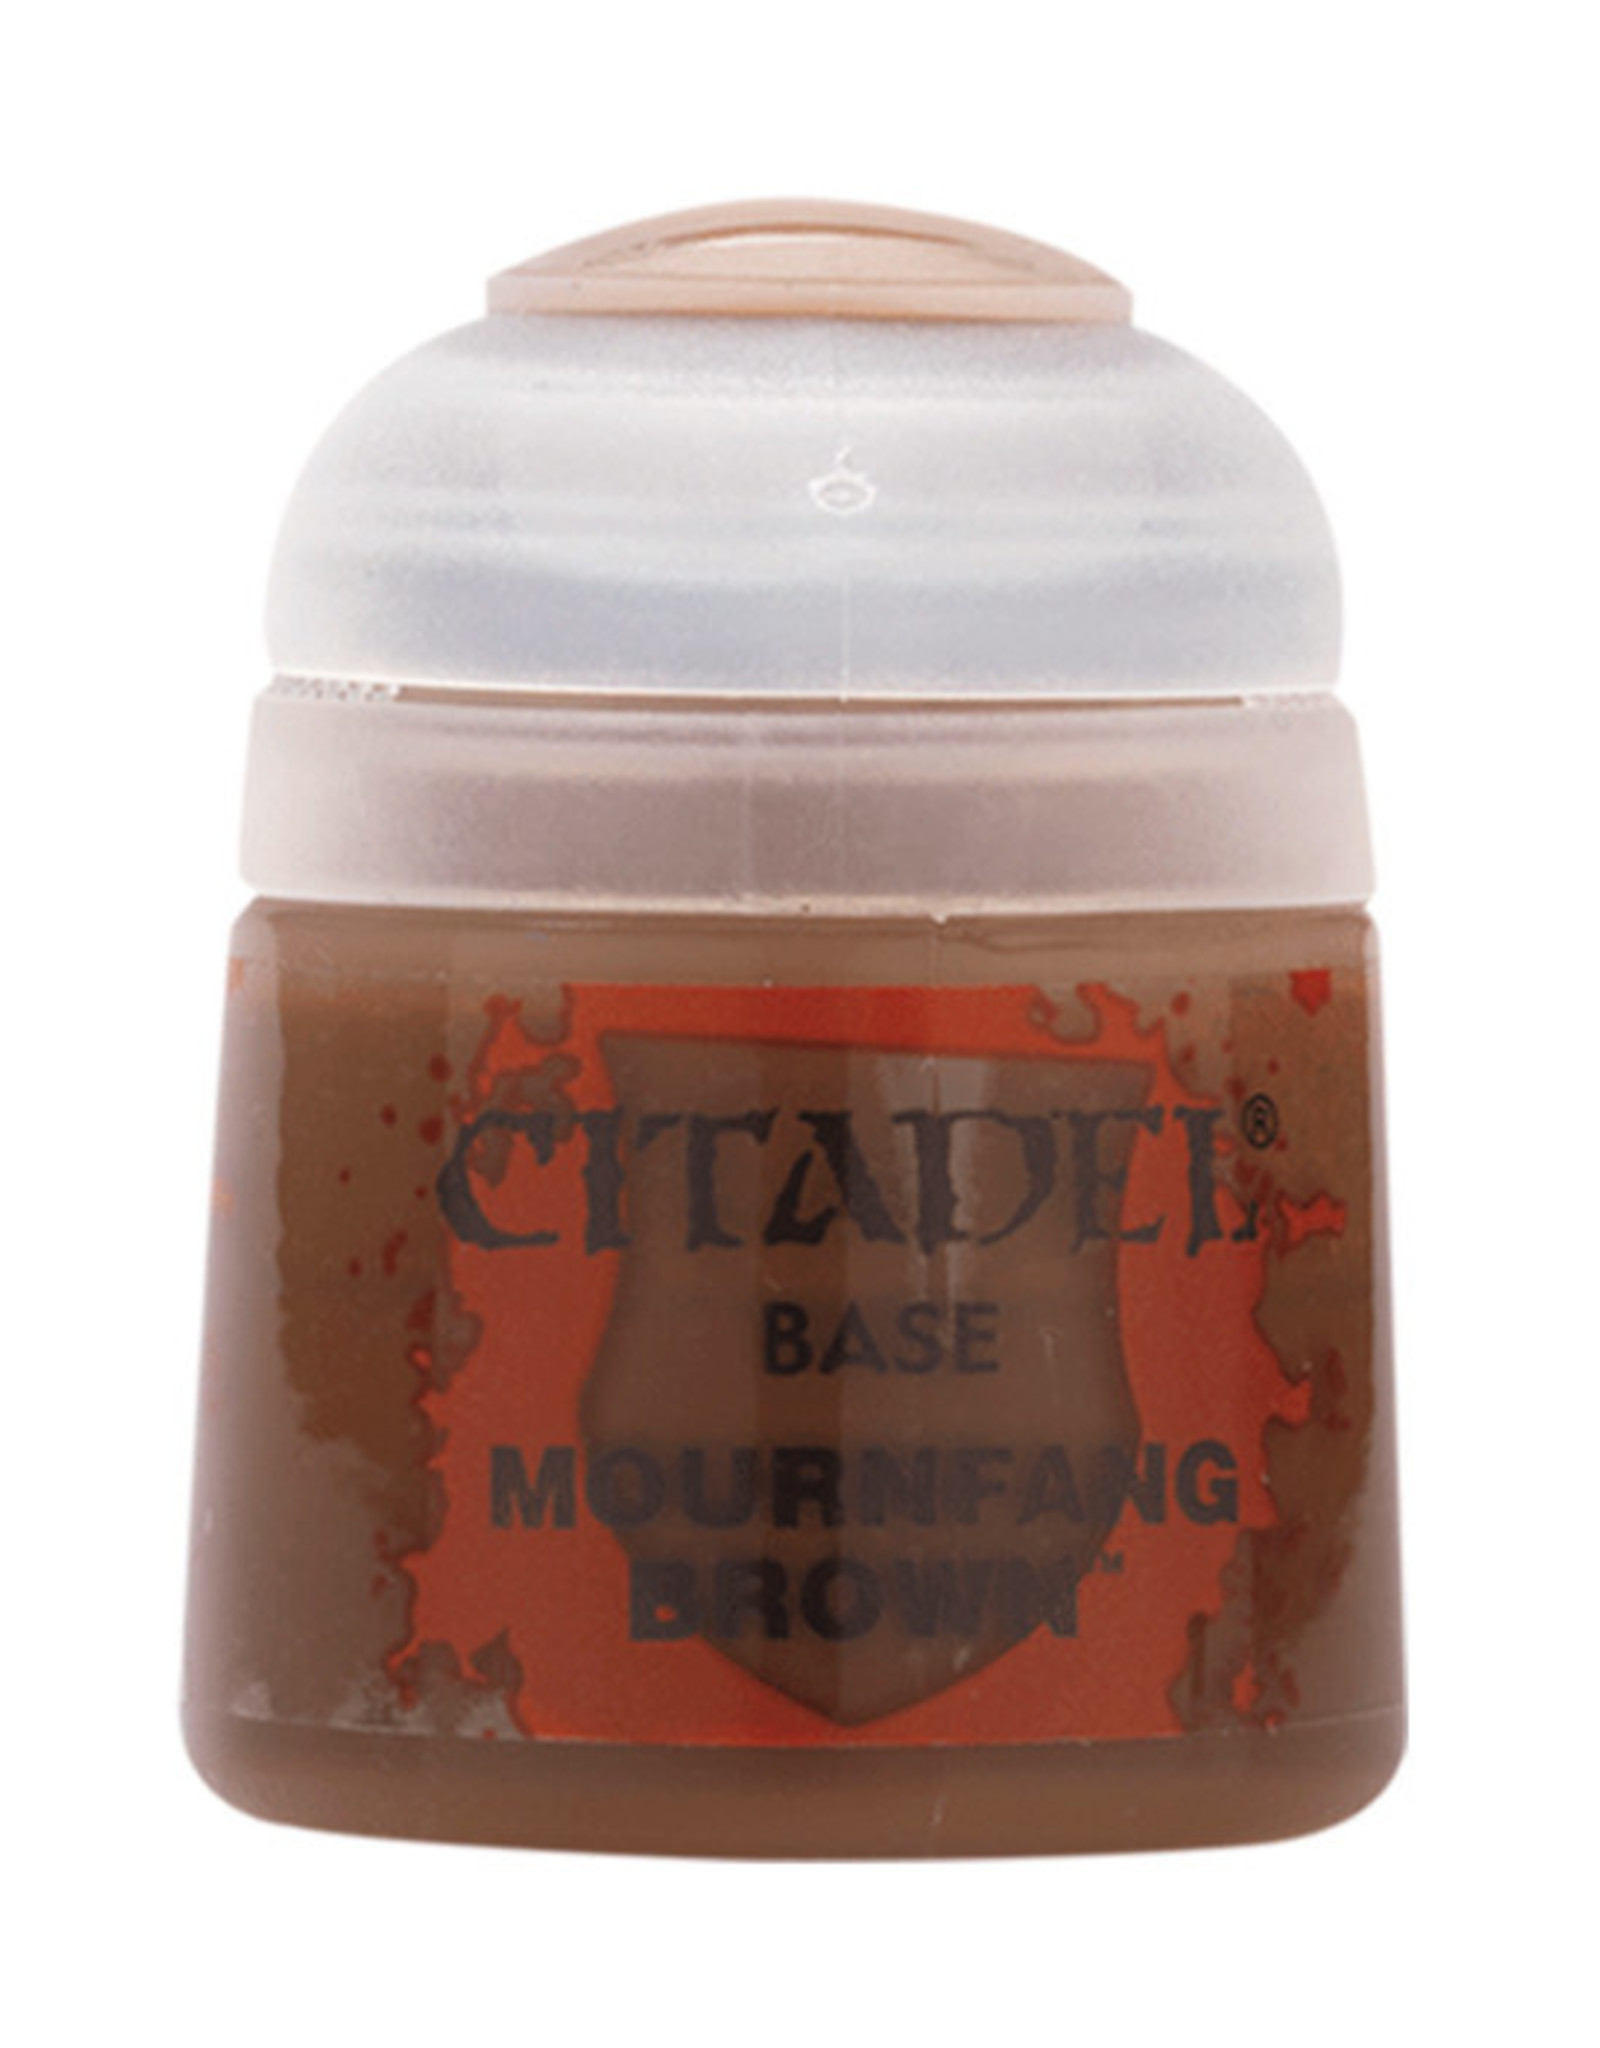 Citadel Citadel Colour: Base - Mournfang Brown